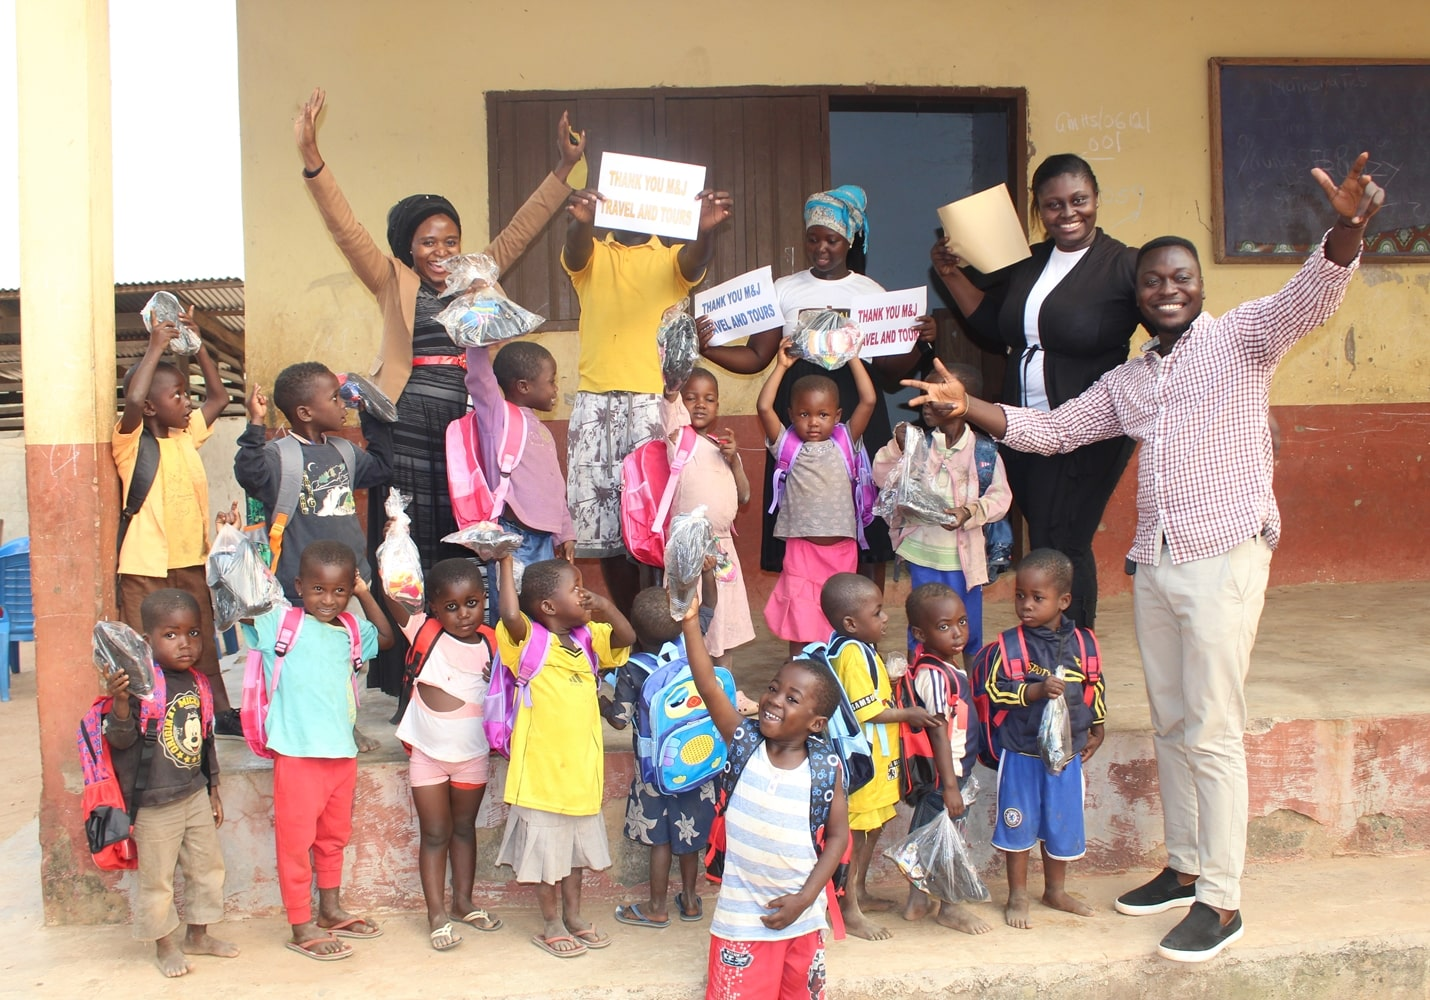 M&J making a donation at Mognori, Ghana